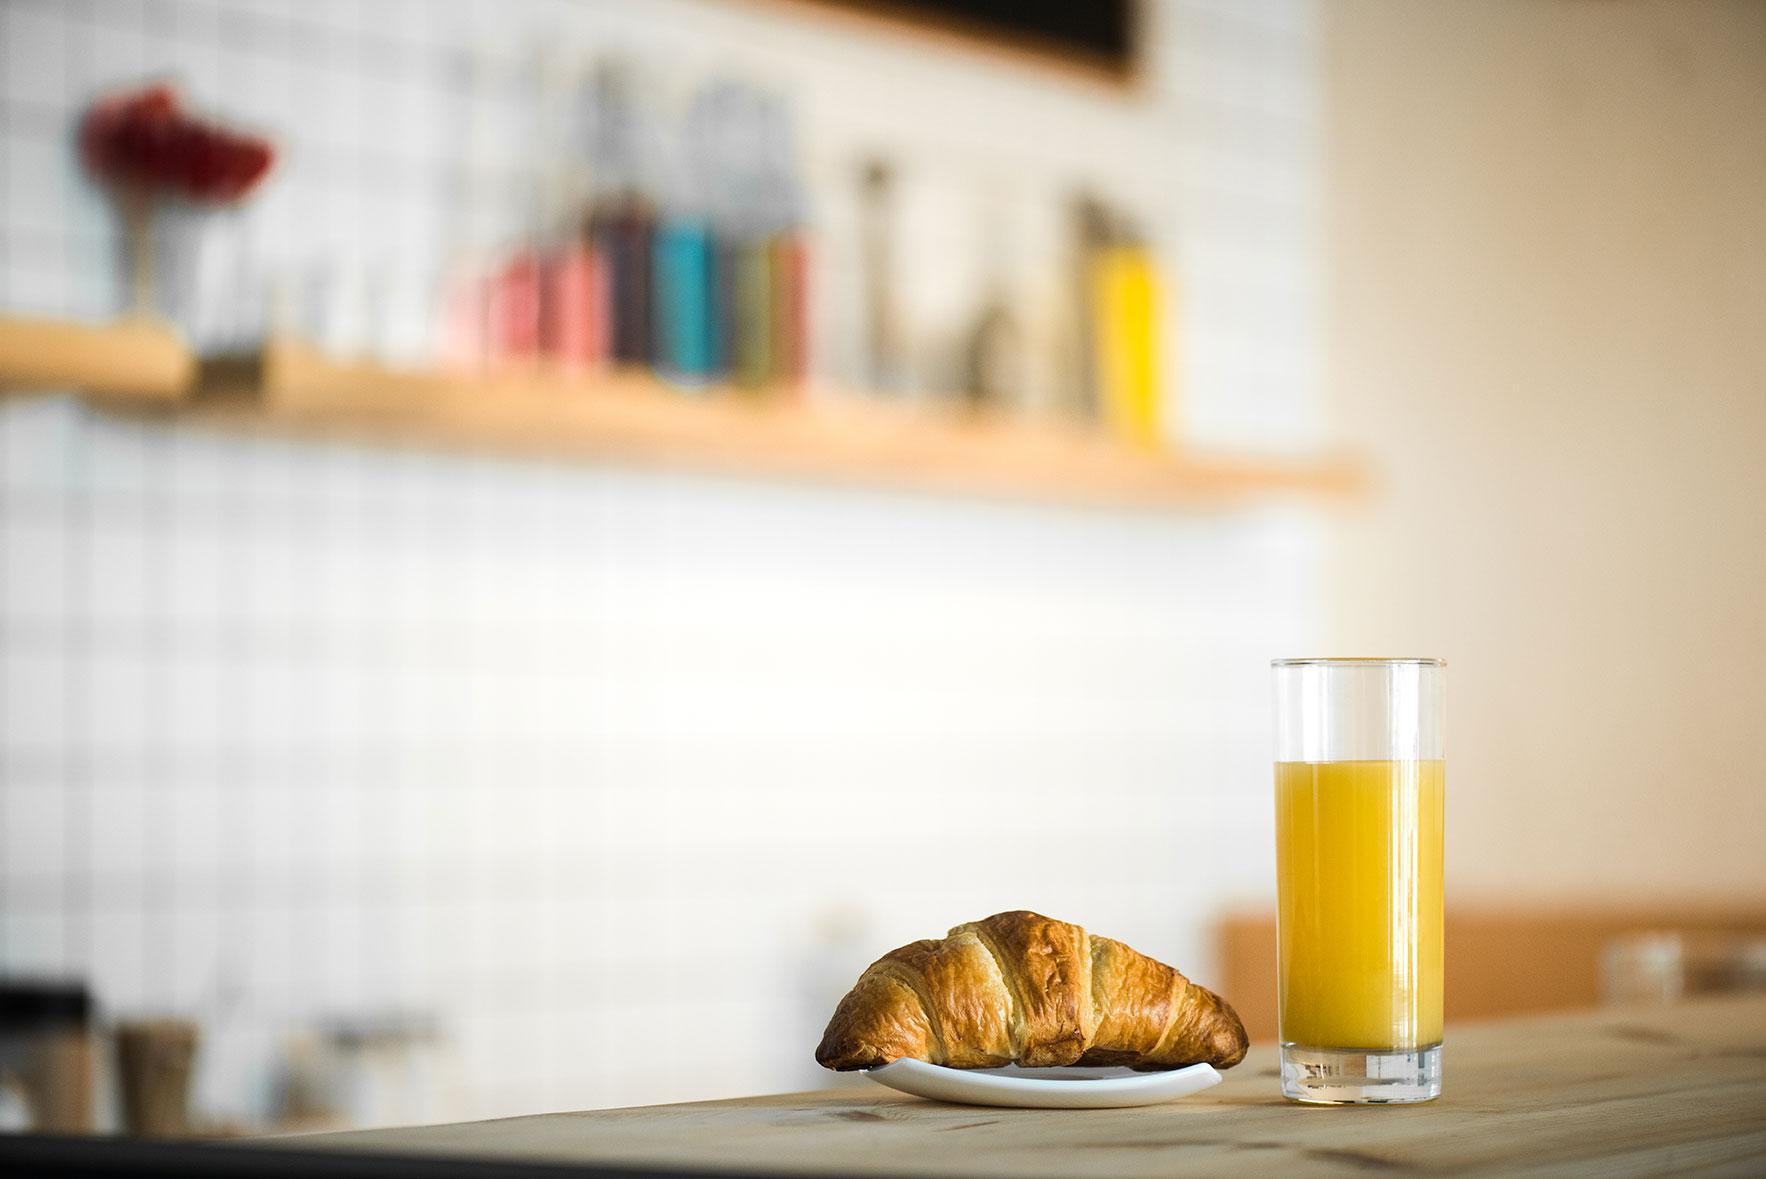 orange-juice-for-breakfast.jpg